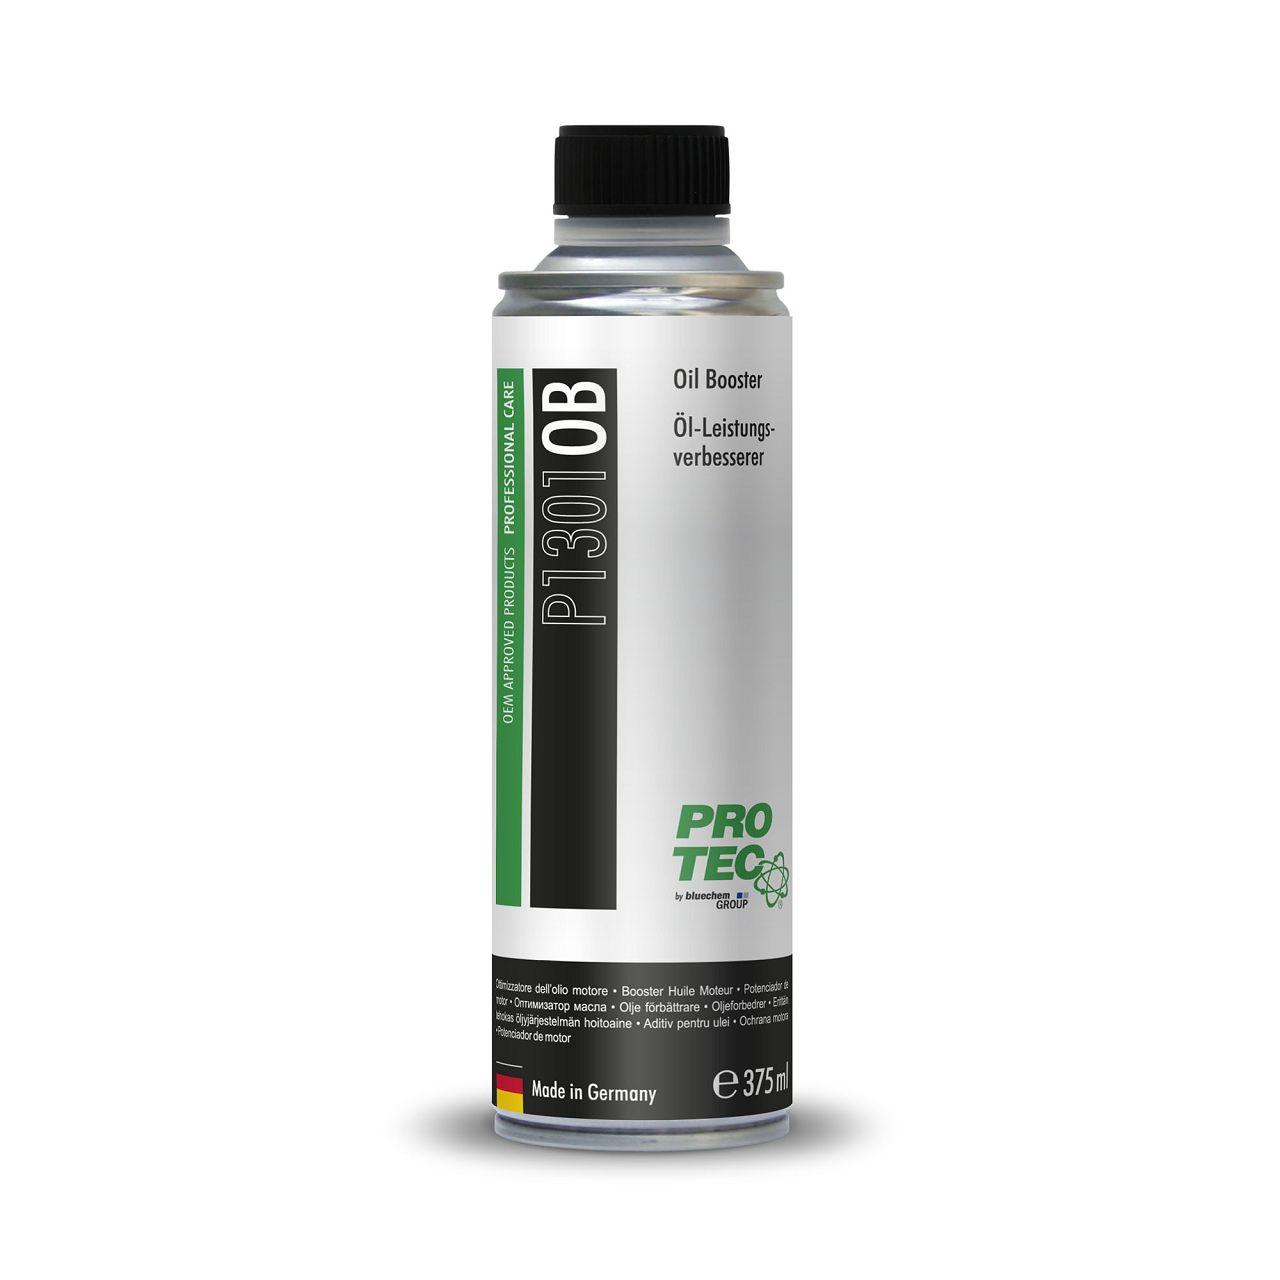 PROTEC P1301 OB Oil Booster Öl Leistungsverbesserer Ölverbesserer 375ml